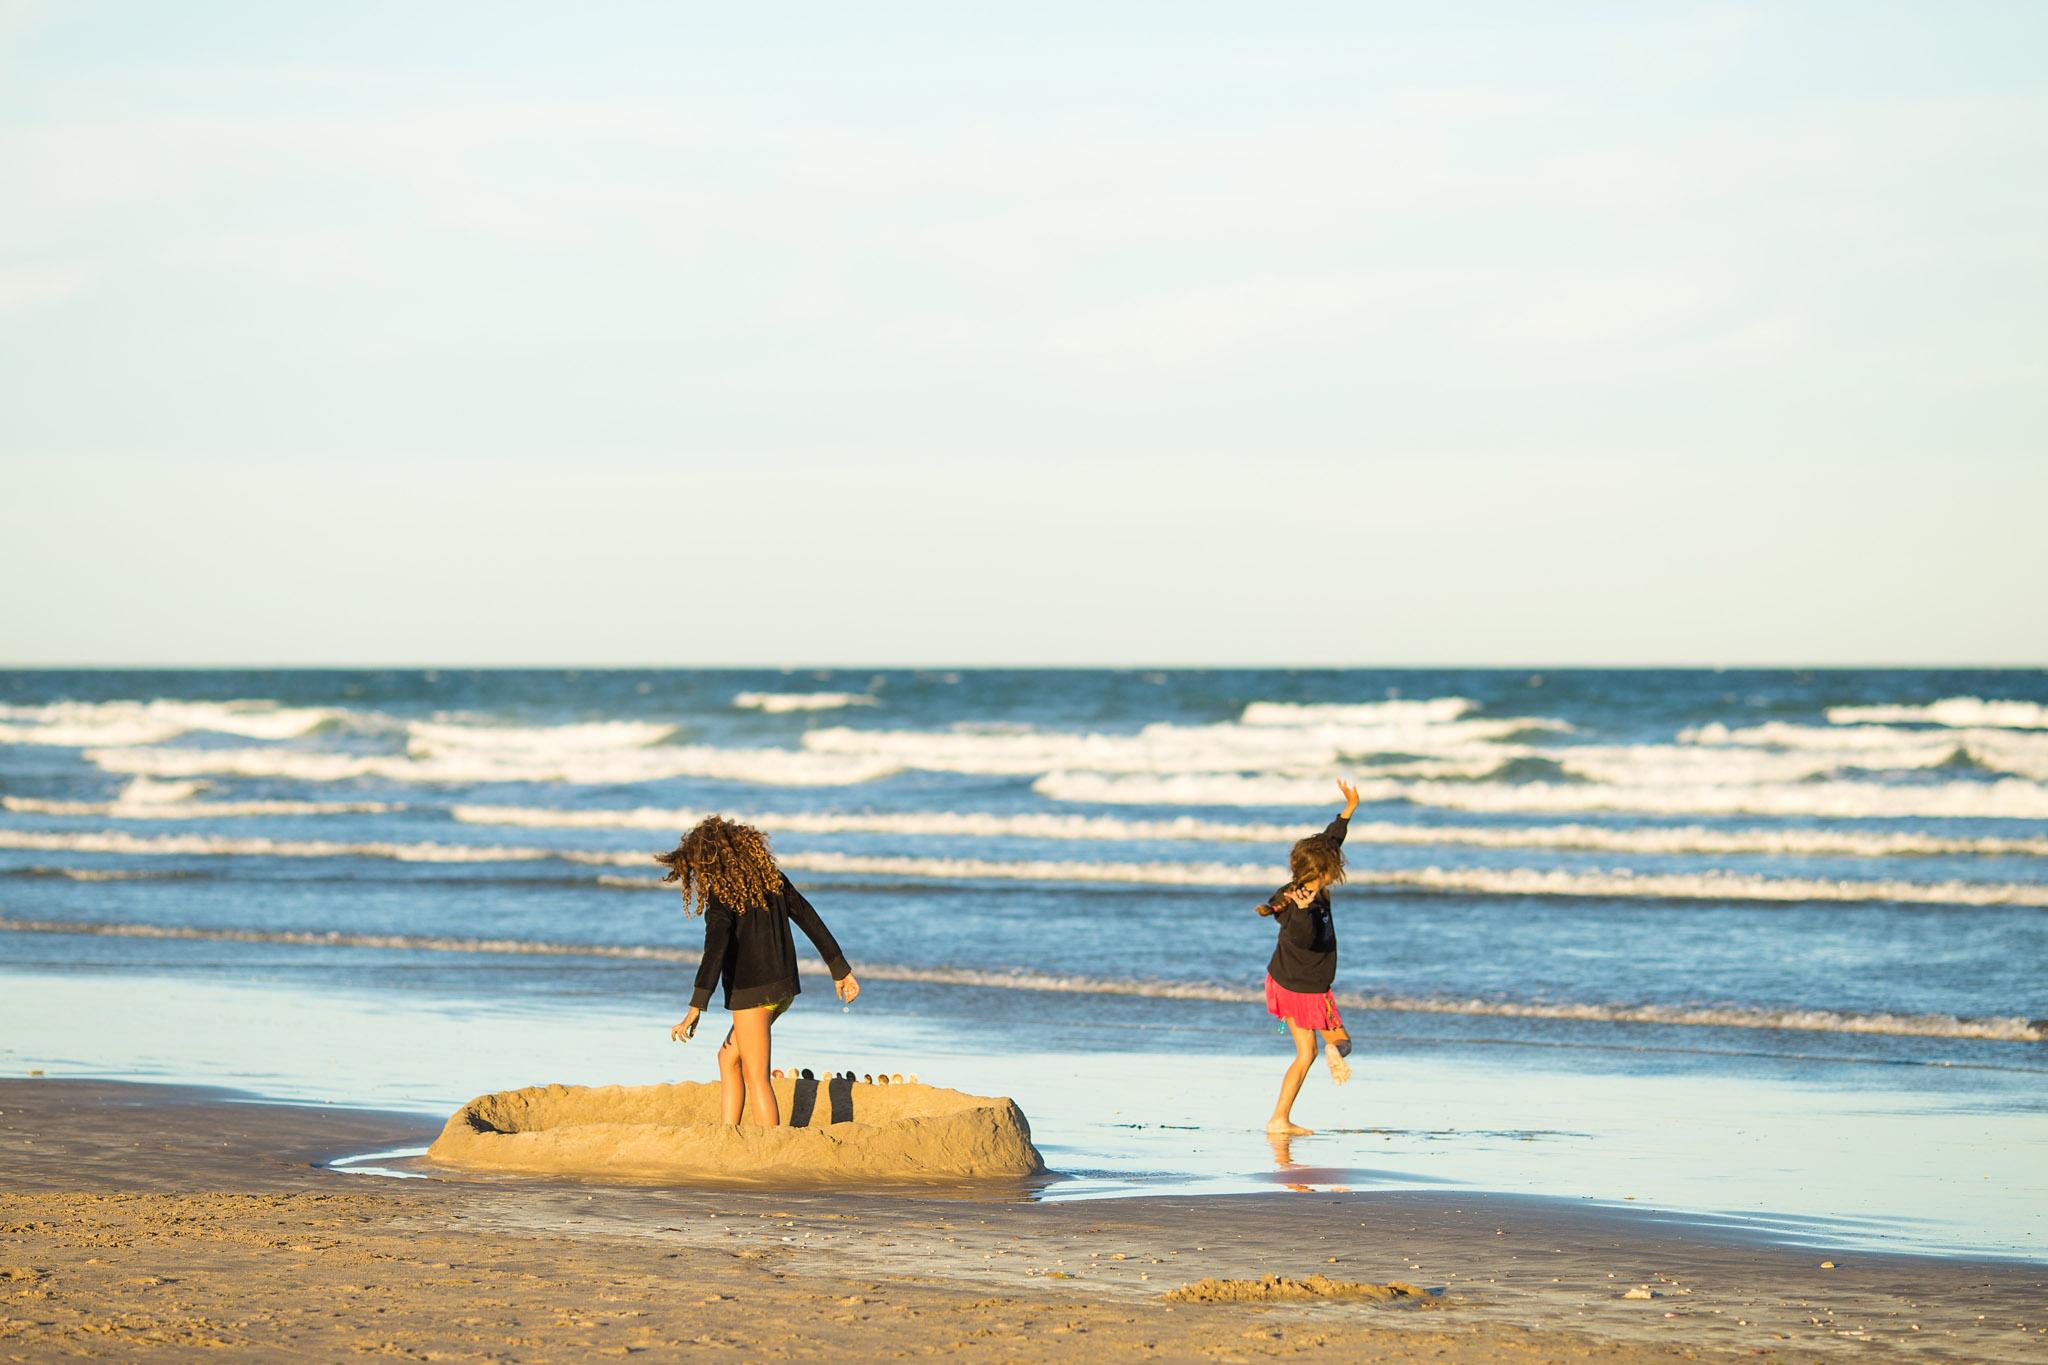 wedding-travellers-argentina-playas-doradas-beach-sand-castle-girls-playing